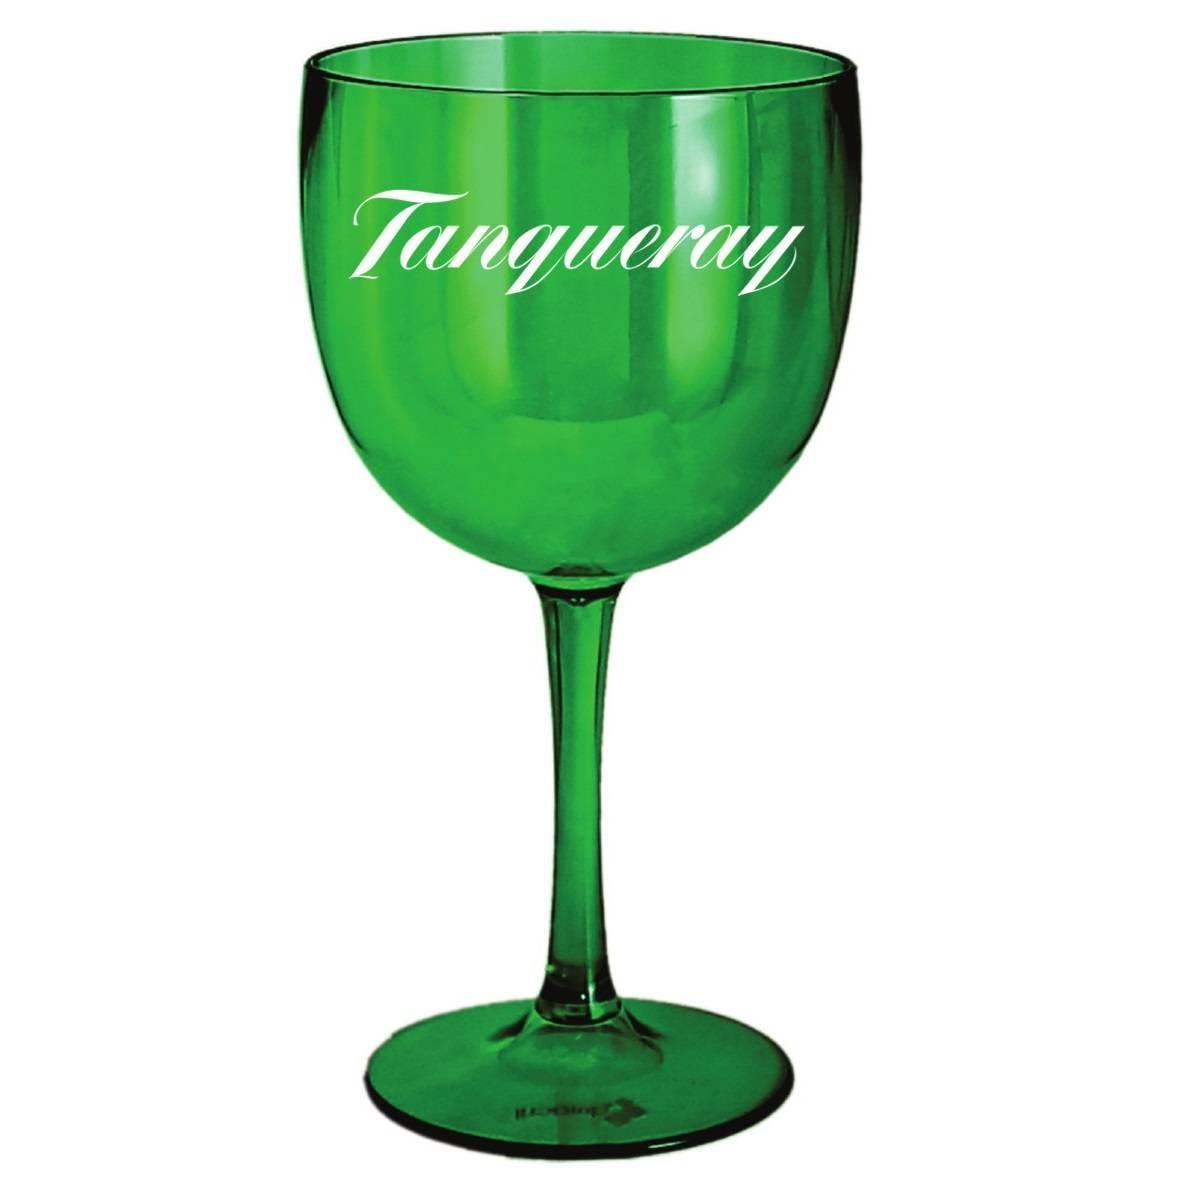 Taça Tanqueray de Gin Acrílico Personalizado Verde 580ml - LCGELETRO